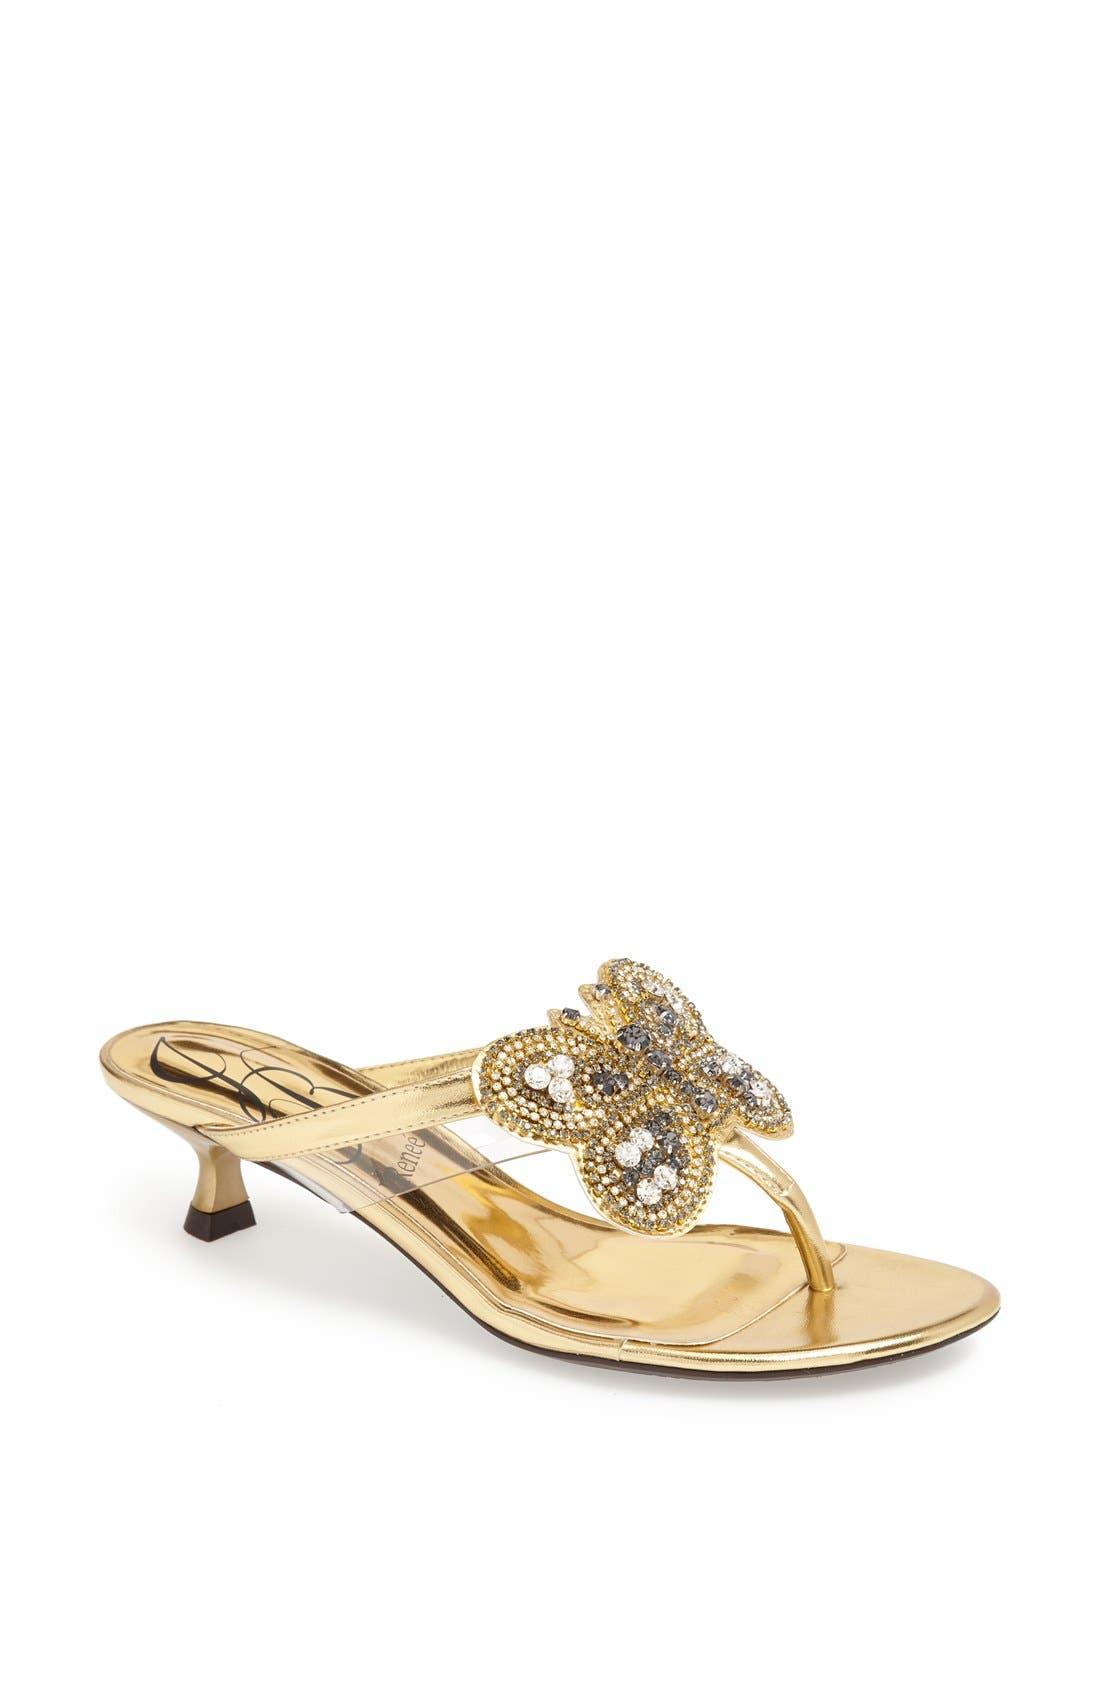 Main Image - J. Reneé 'Imbrie' Embellished Thong Sandal